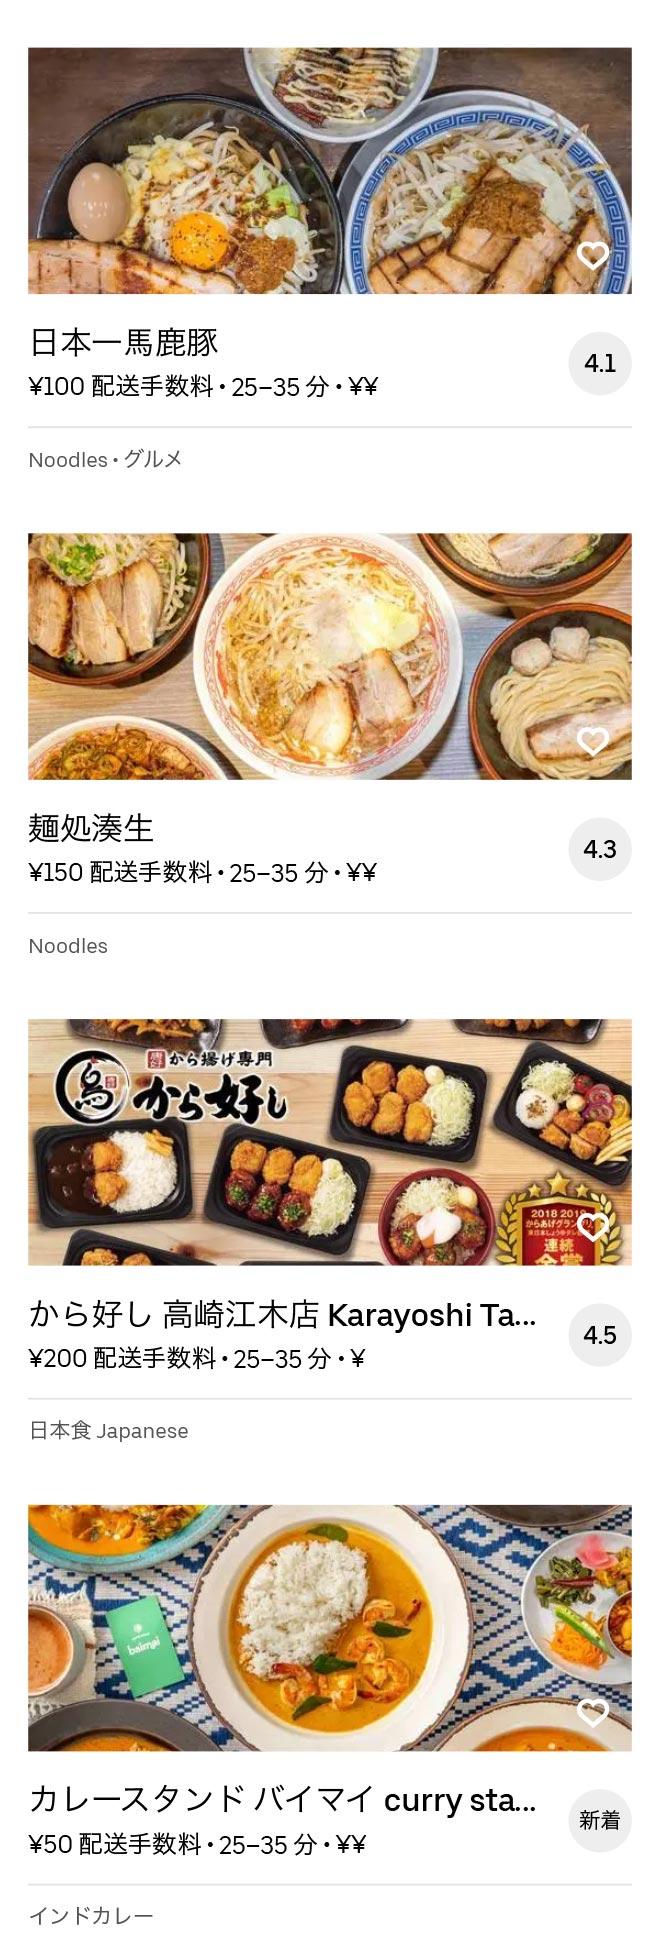 Tonyamachi menu 2010 04